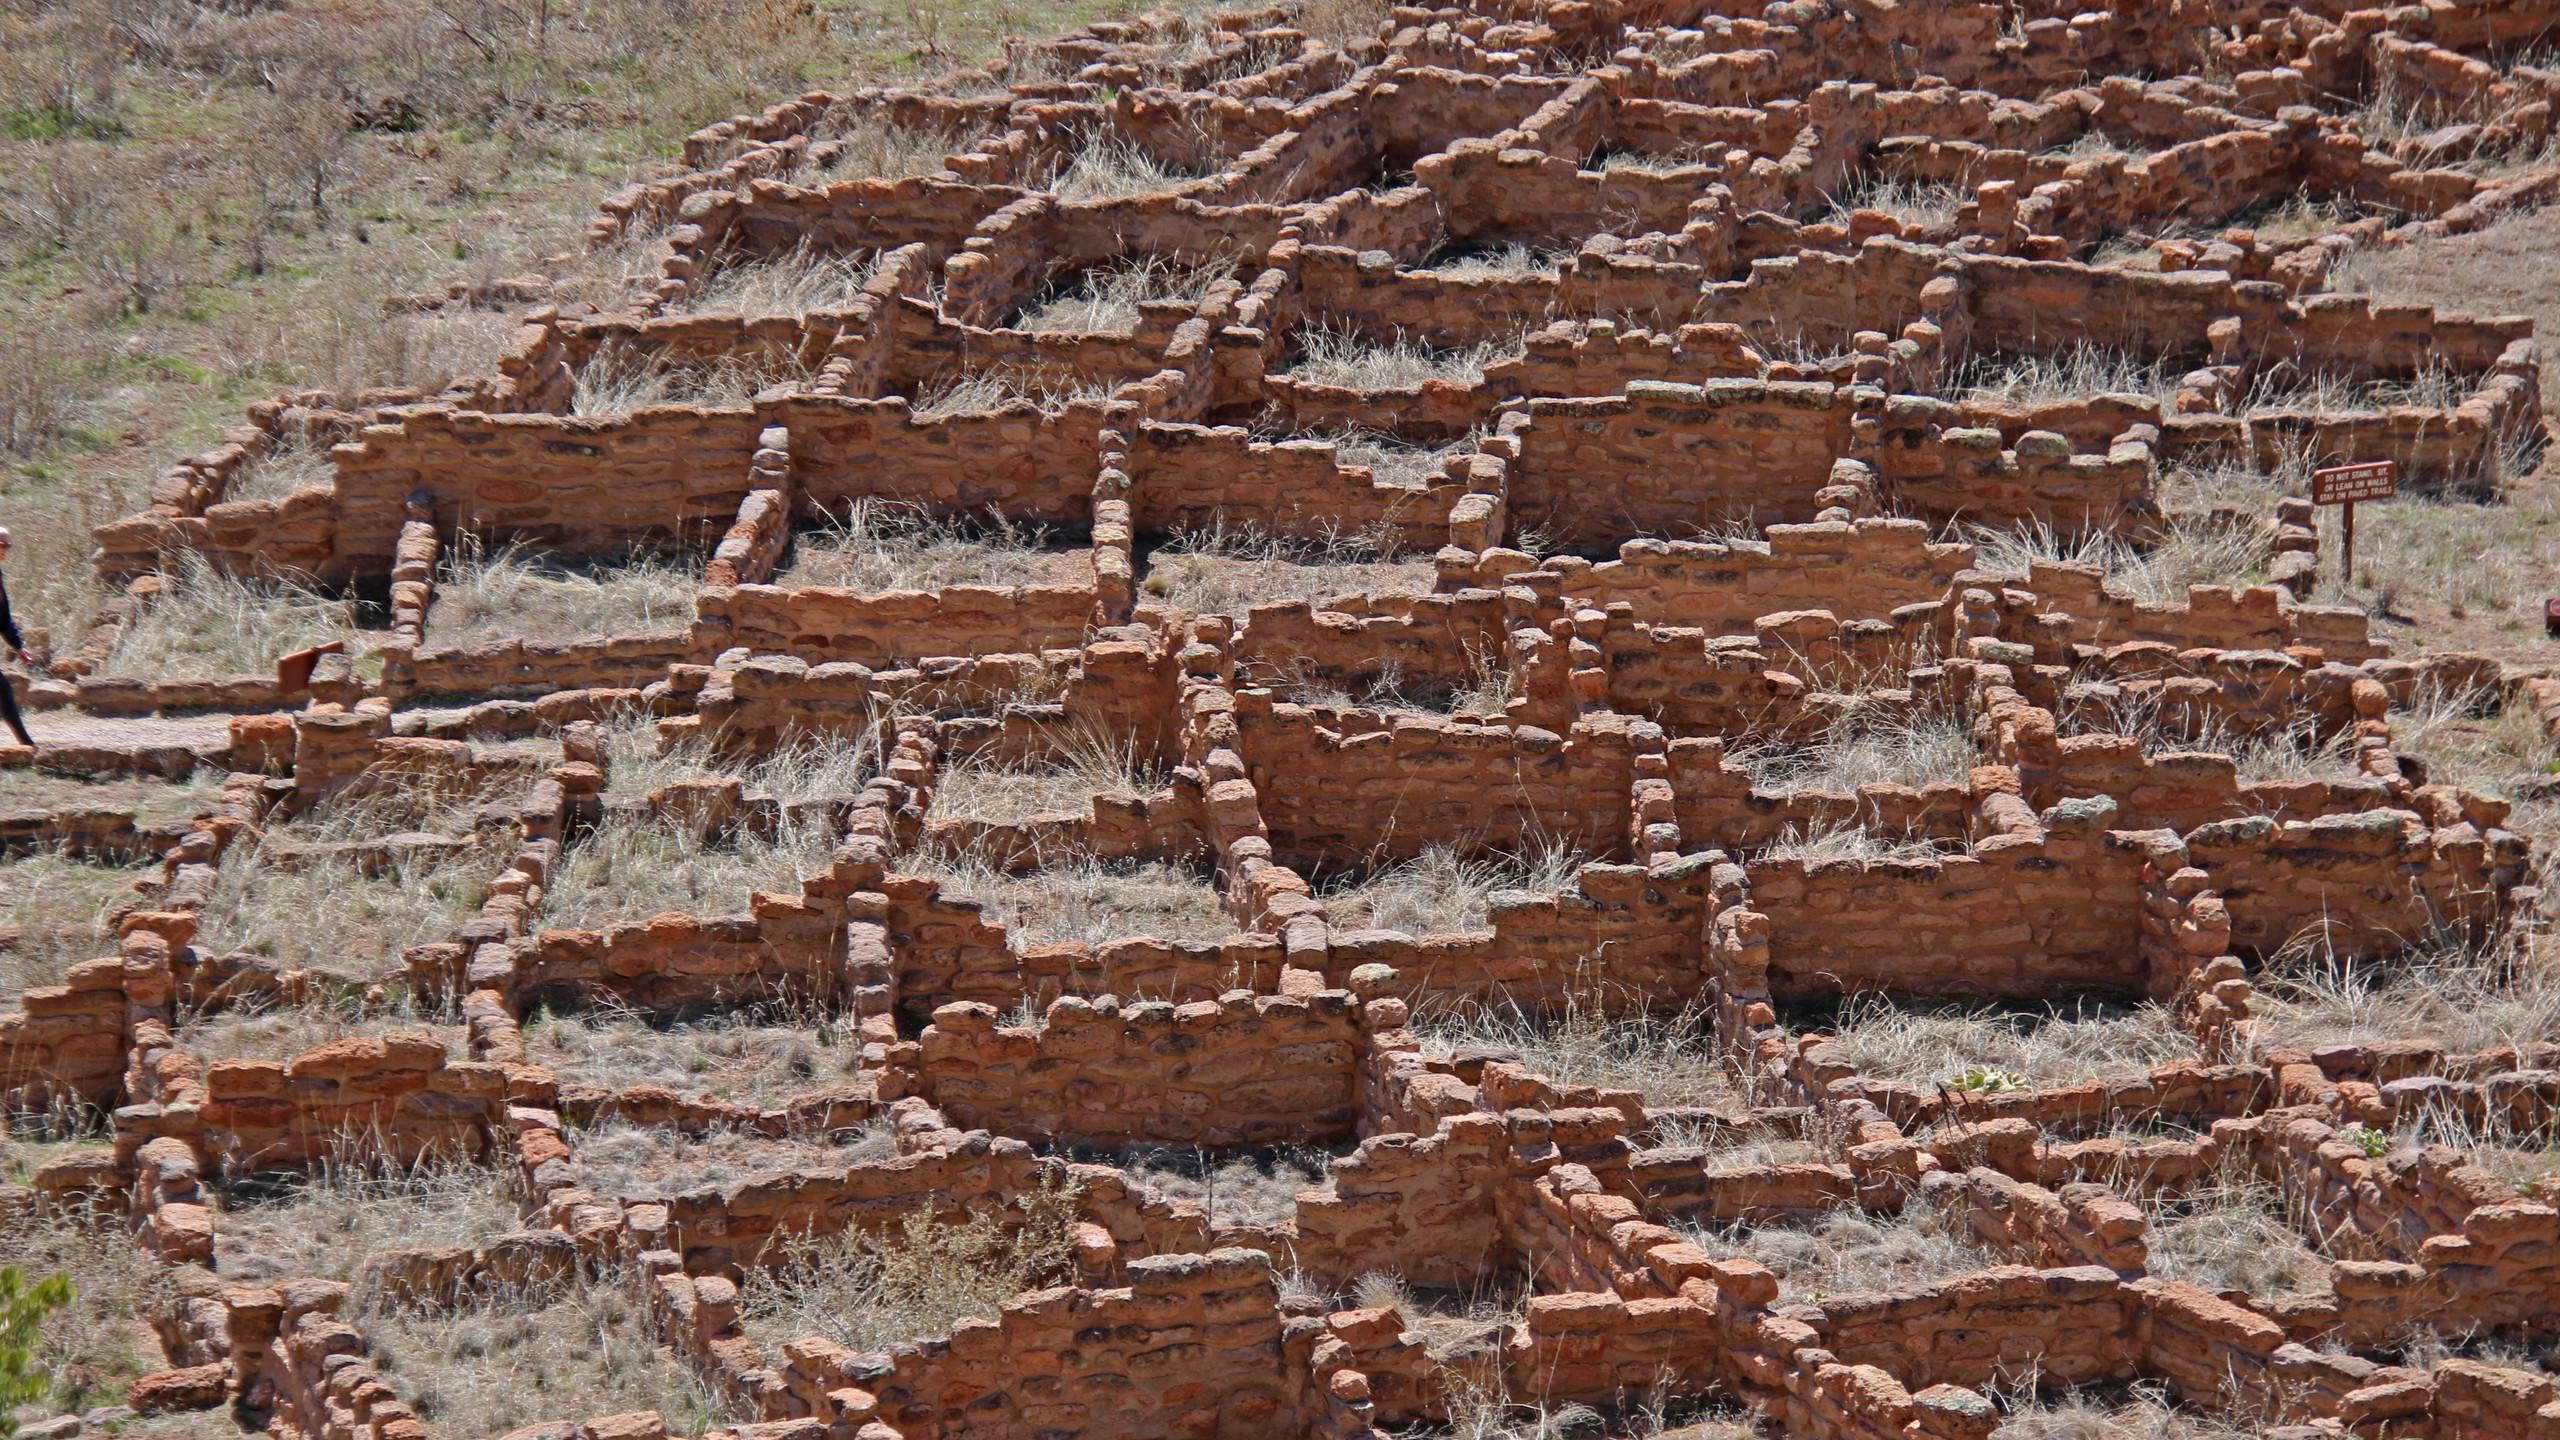 Pueblo ruins at Bandelier National Monument